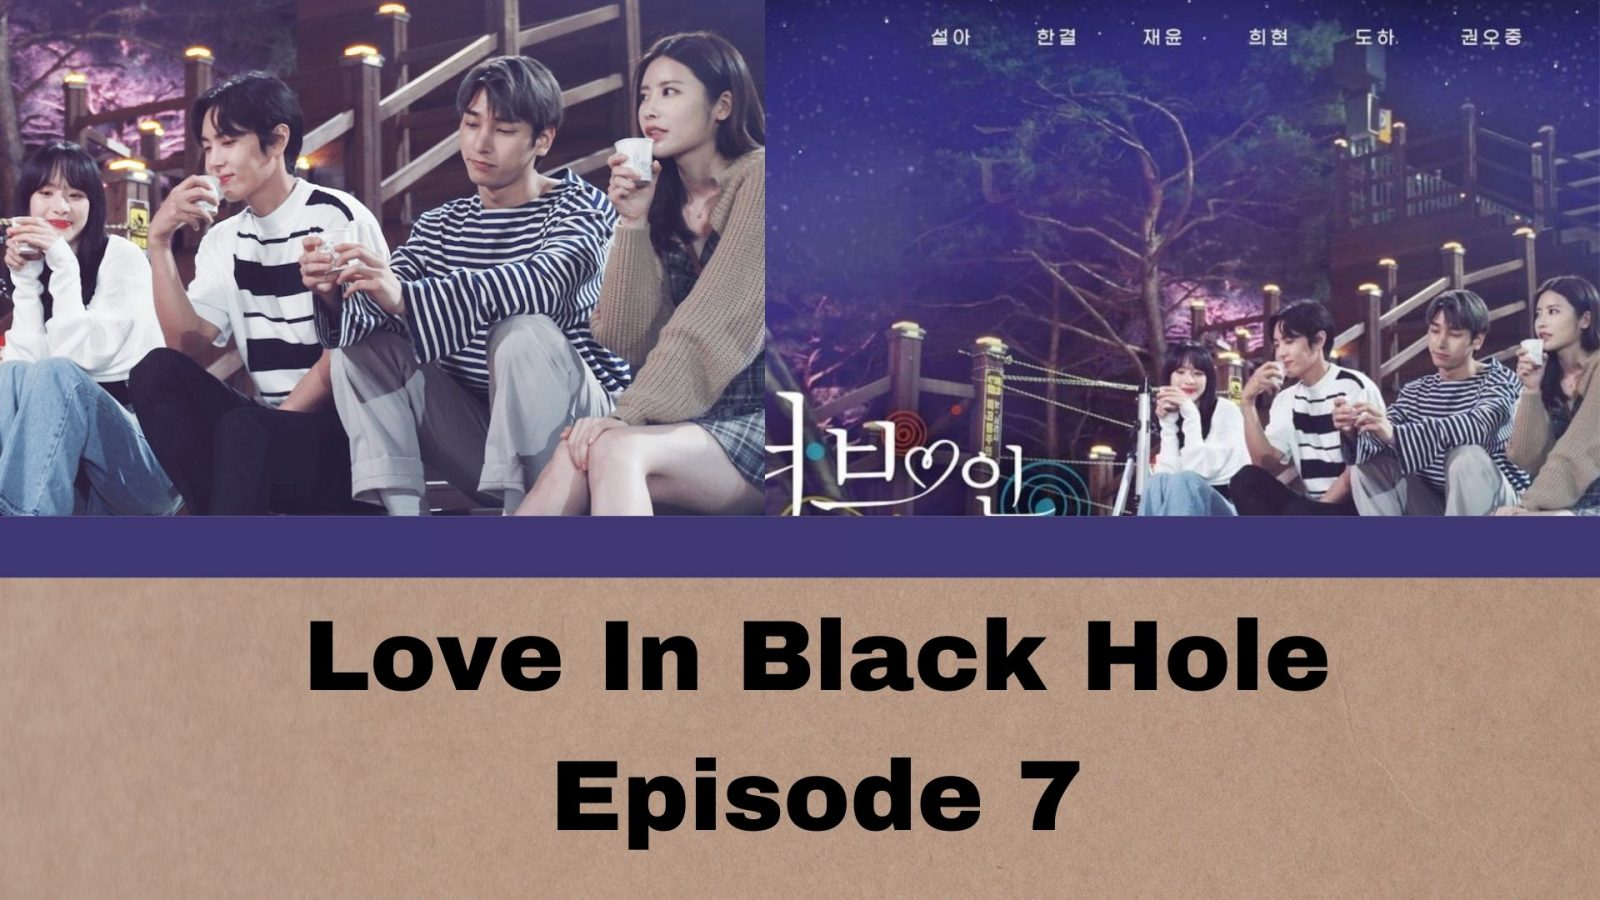 Love In Black Hole Episode 7: Release Date & Spoilers